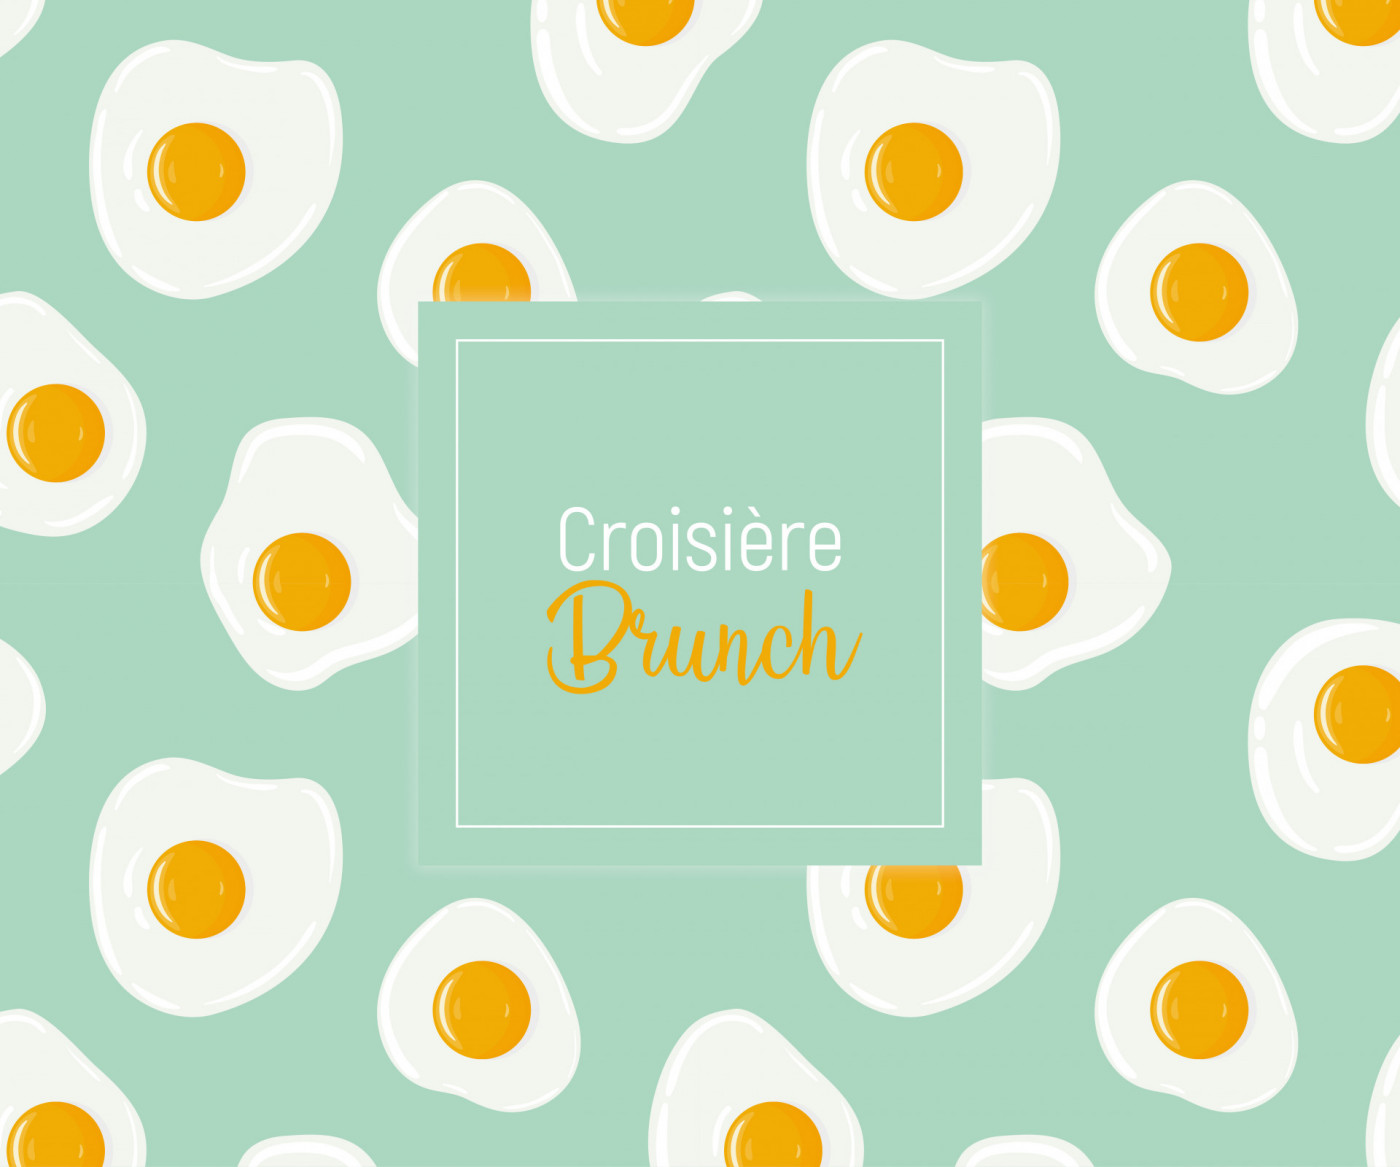 Croisiere brunch visuel